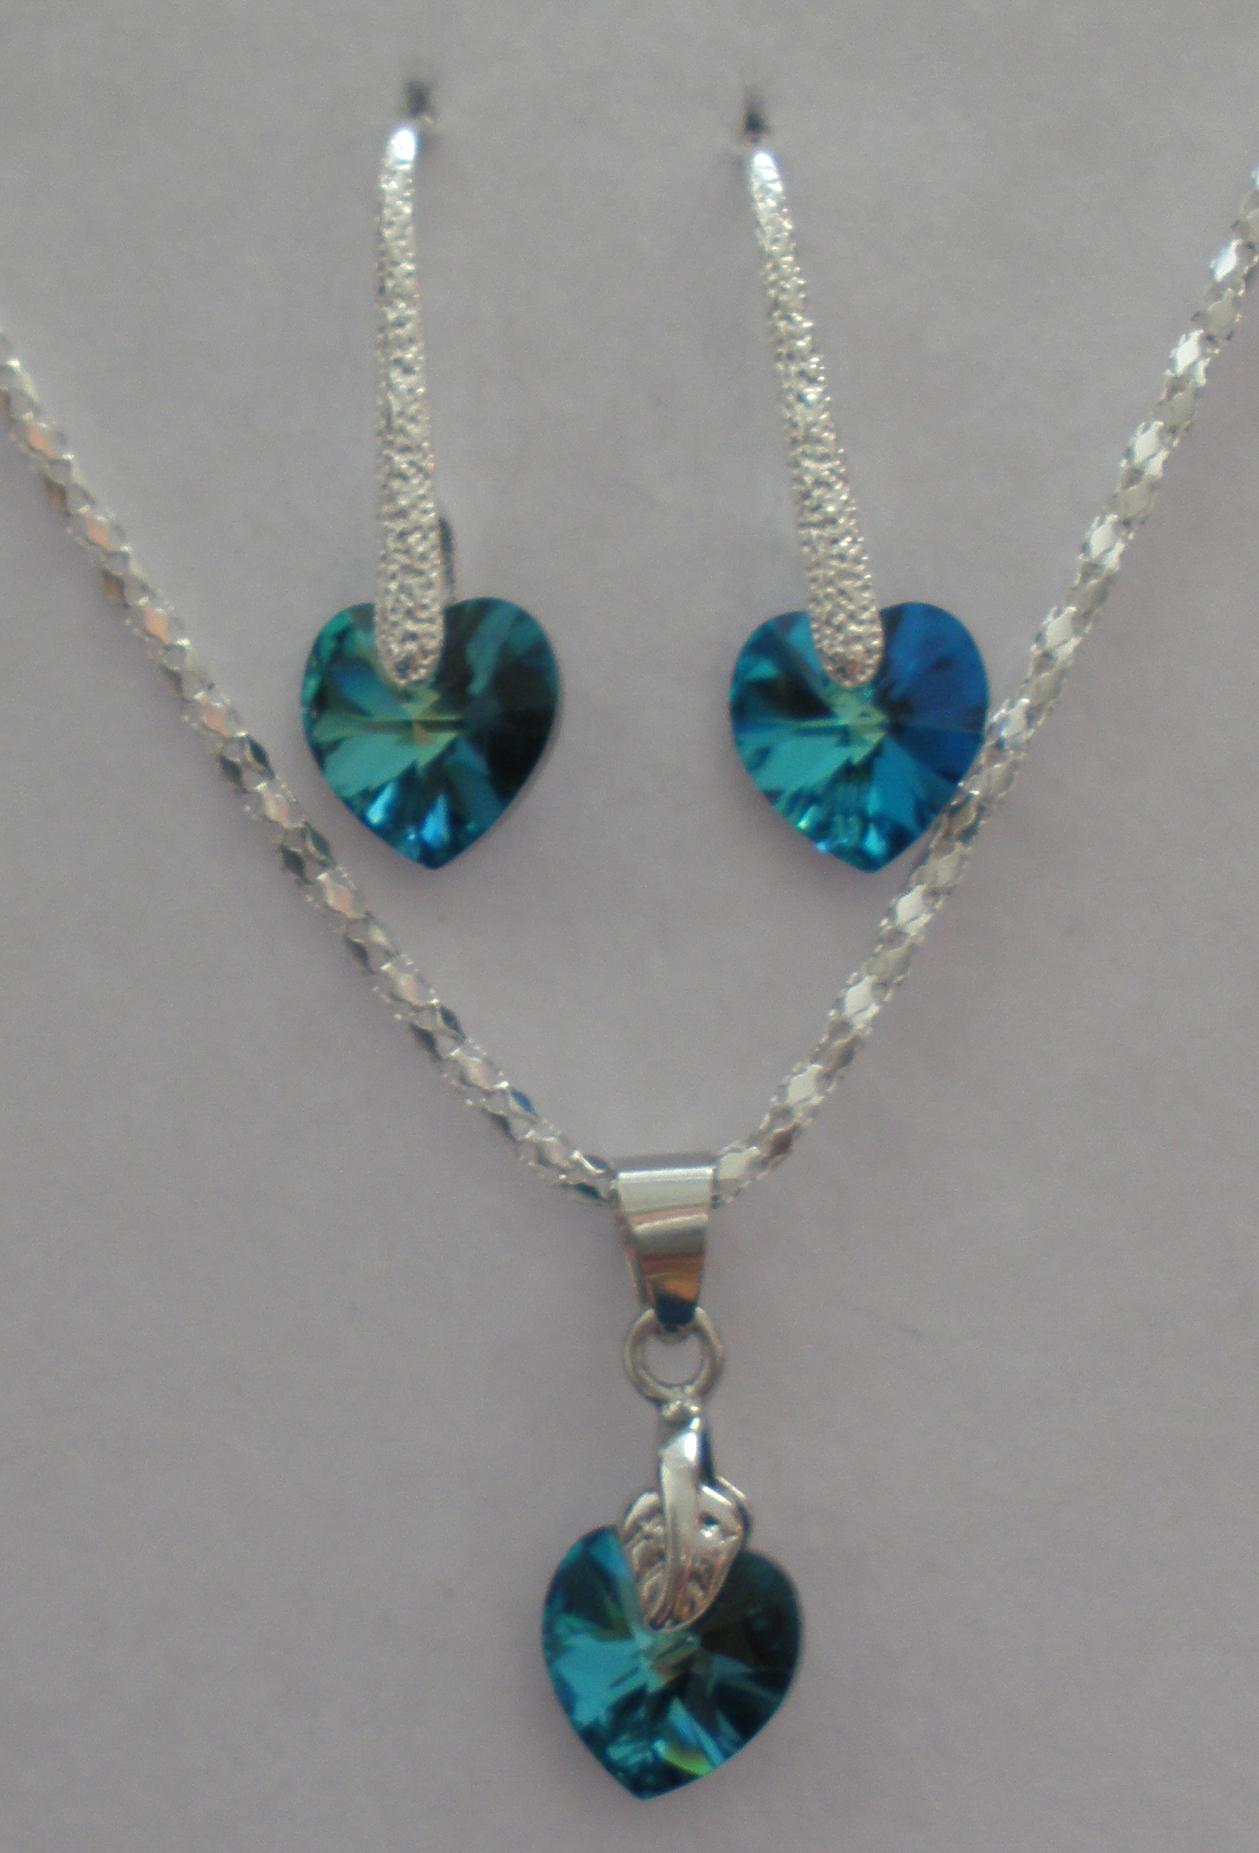 Sada Swarovski Srdce Bermuda Blue s bižuterními komponenty (Sw10Sr33) 740ccf8f9ab